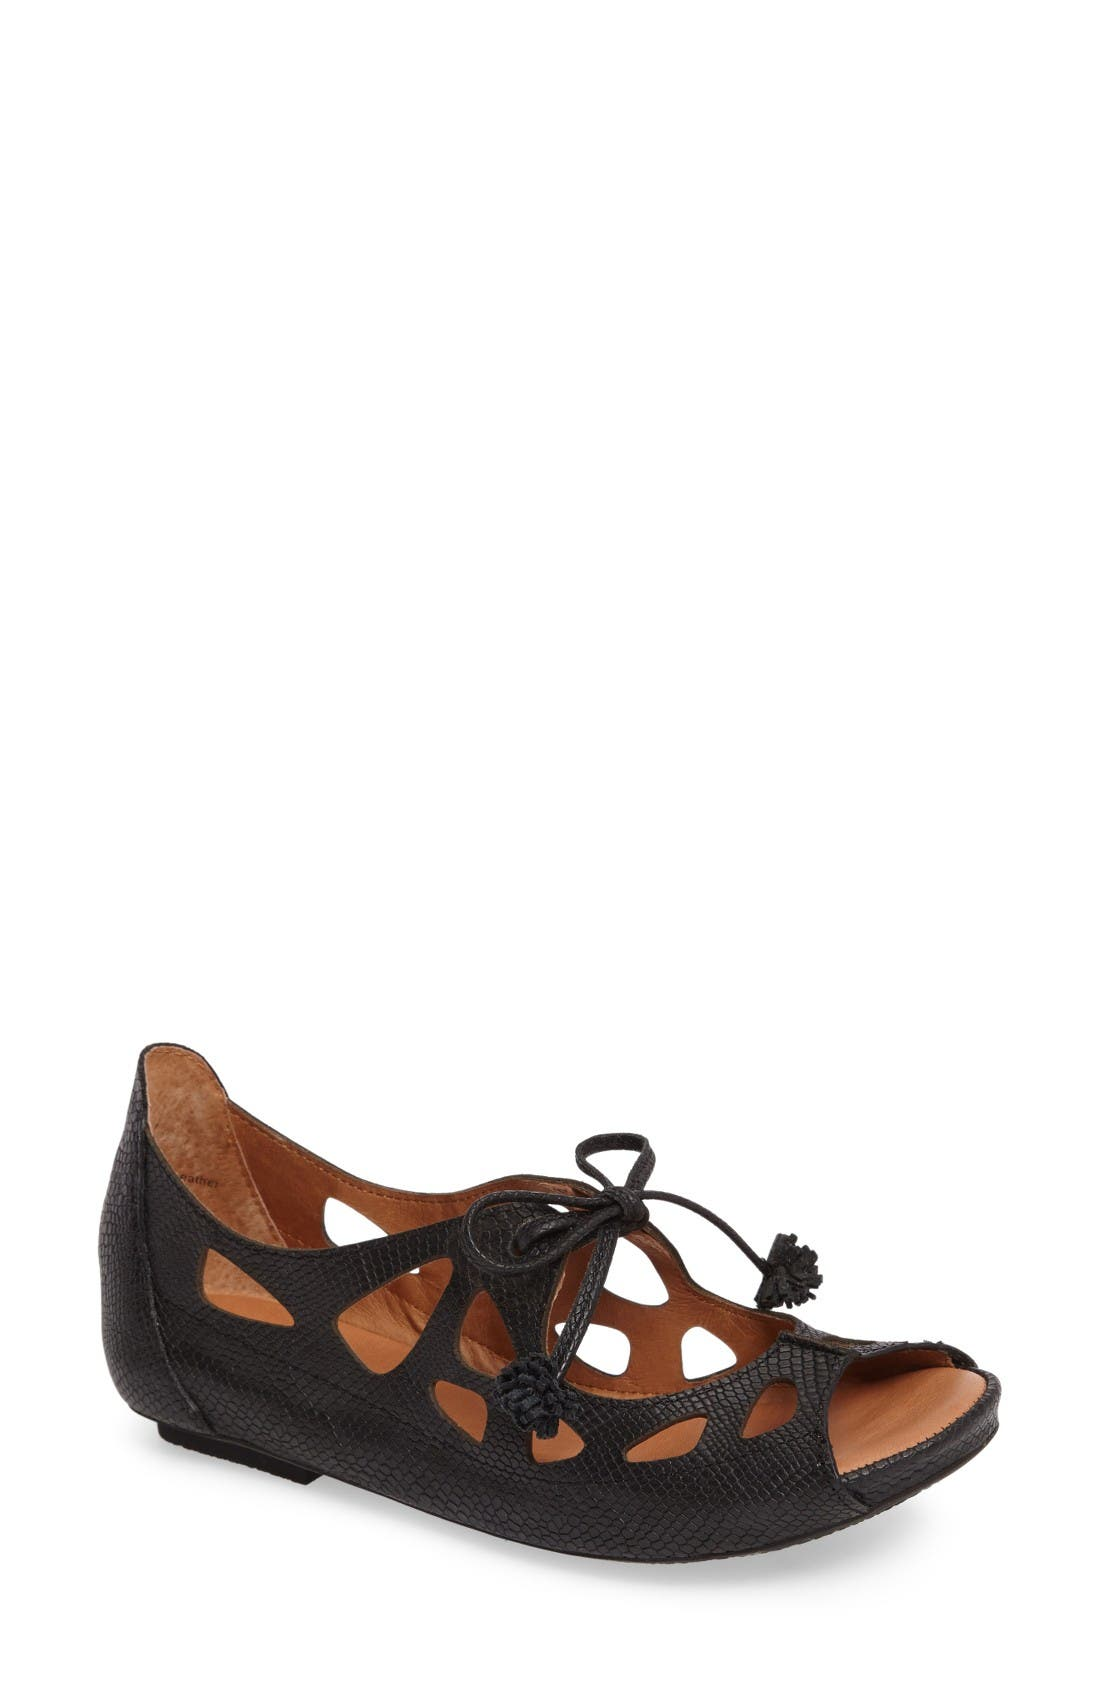 Main Image - Gentle Souls Brynn Cutout Sandal (Women)